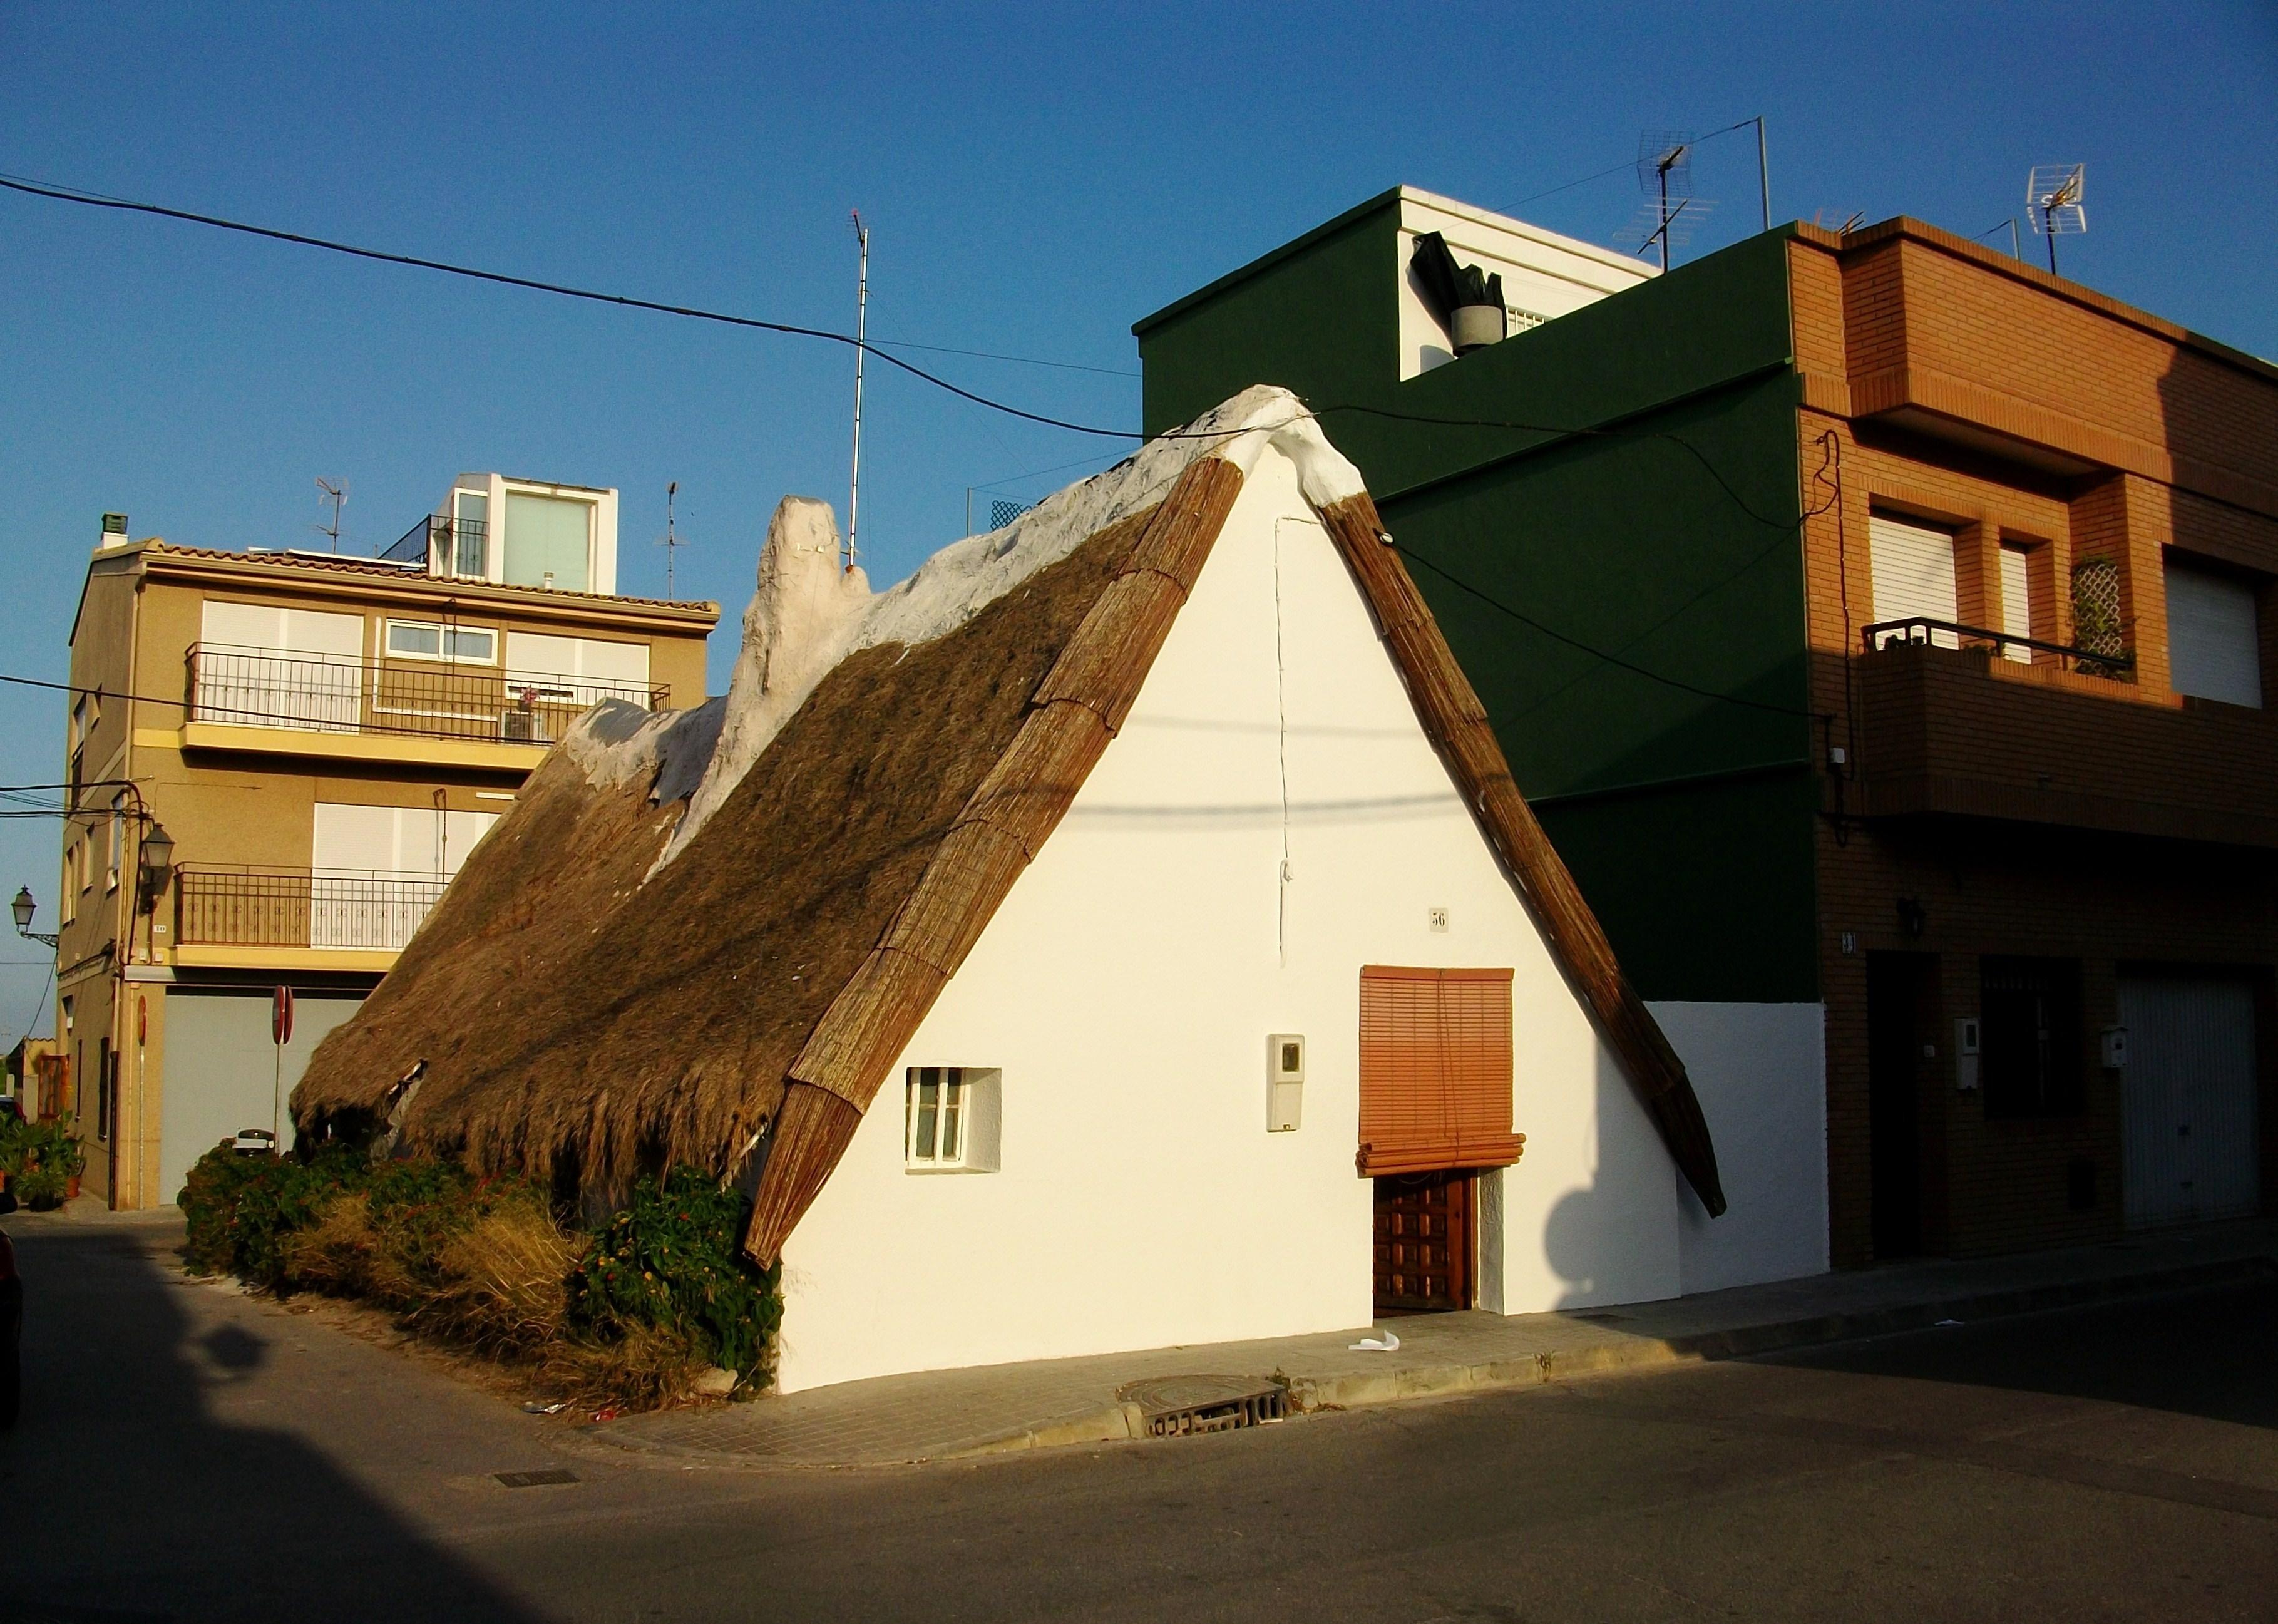 File:Barraca al Palmar, País Valencià.JPG - Wikimedia Commons